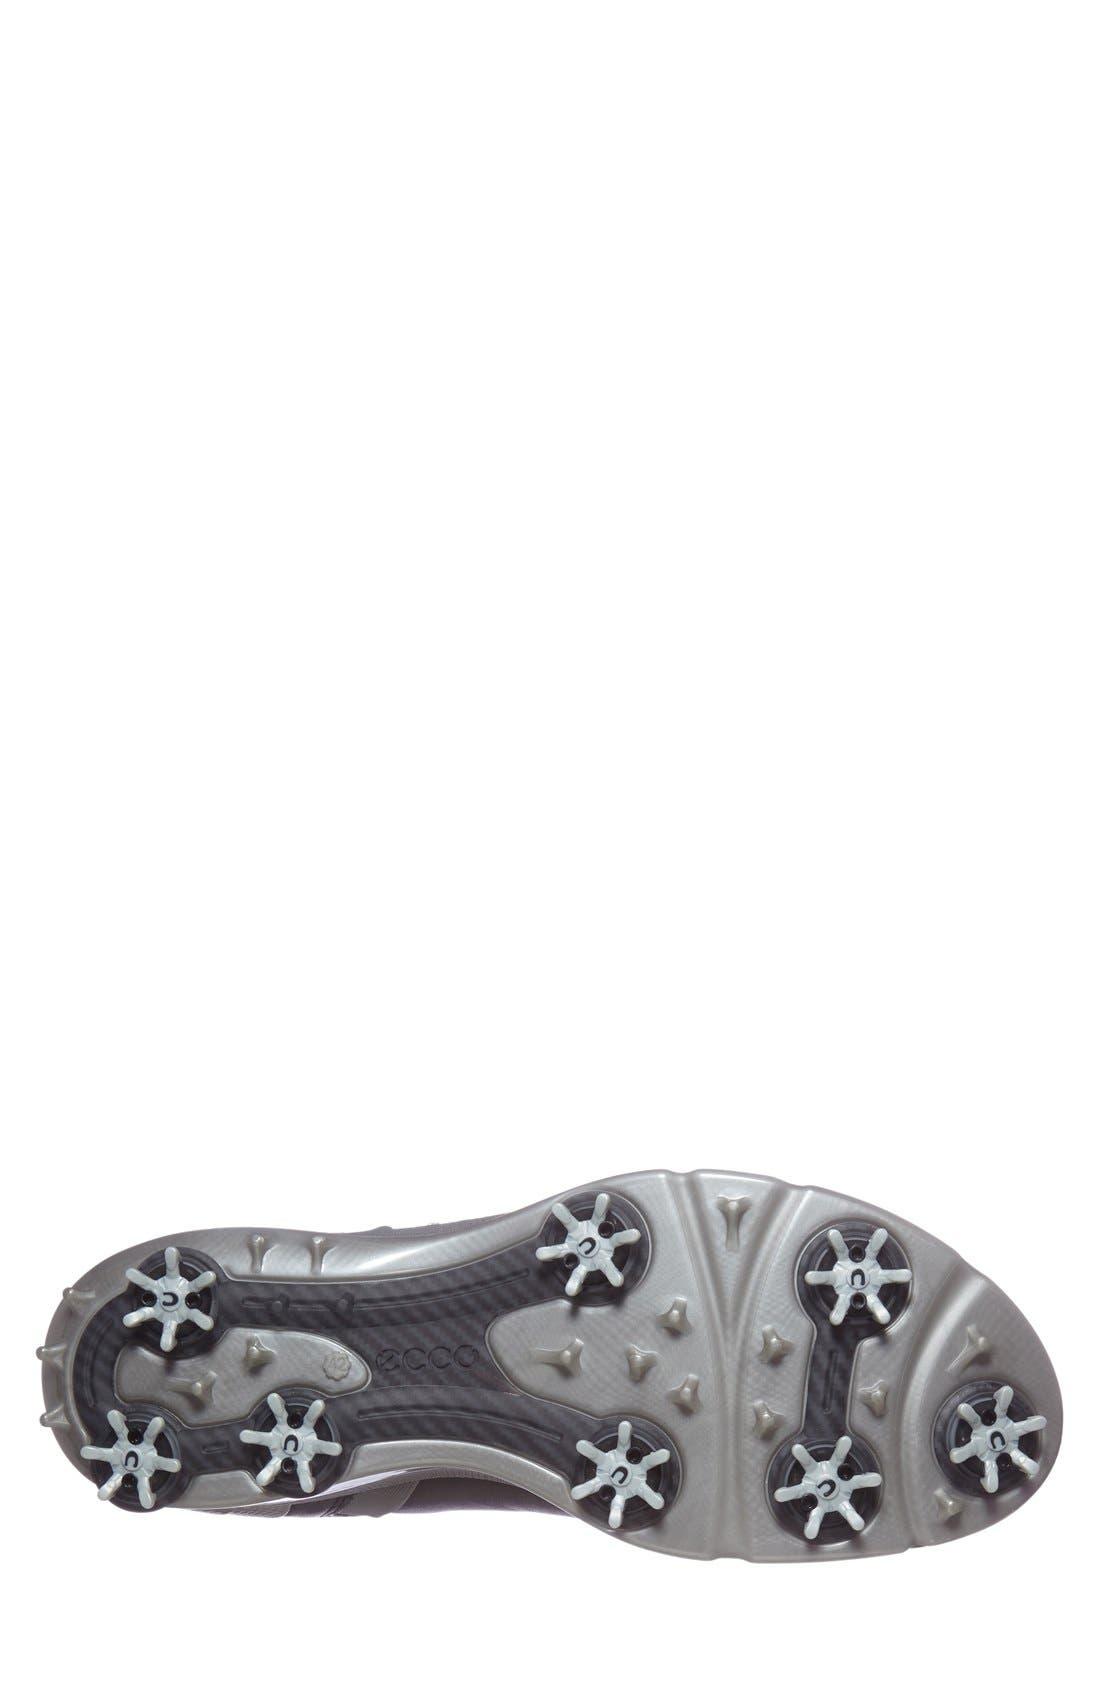 BIOM Hydromax Waterproof Golf Shoe,                             Alternate thumbnail 4, color,                             Black/ Transparent